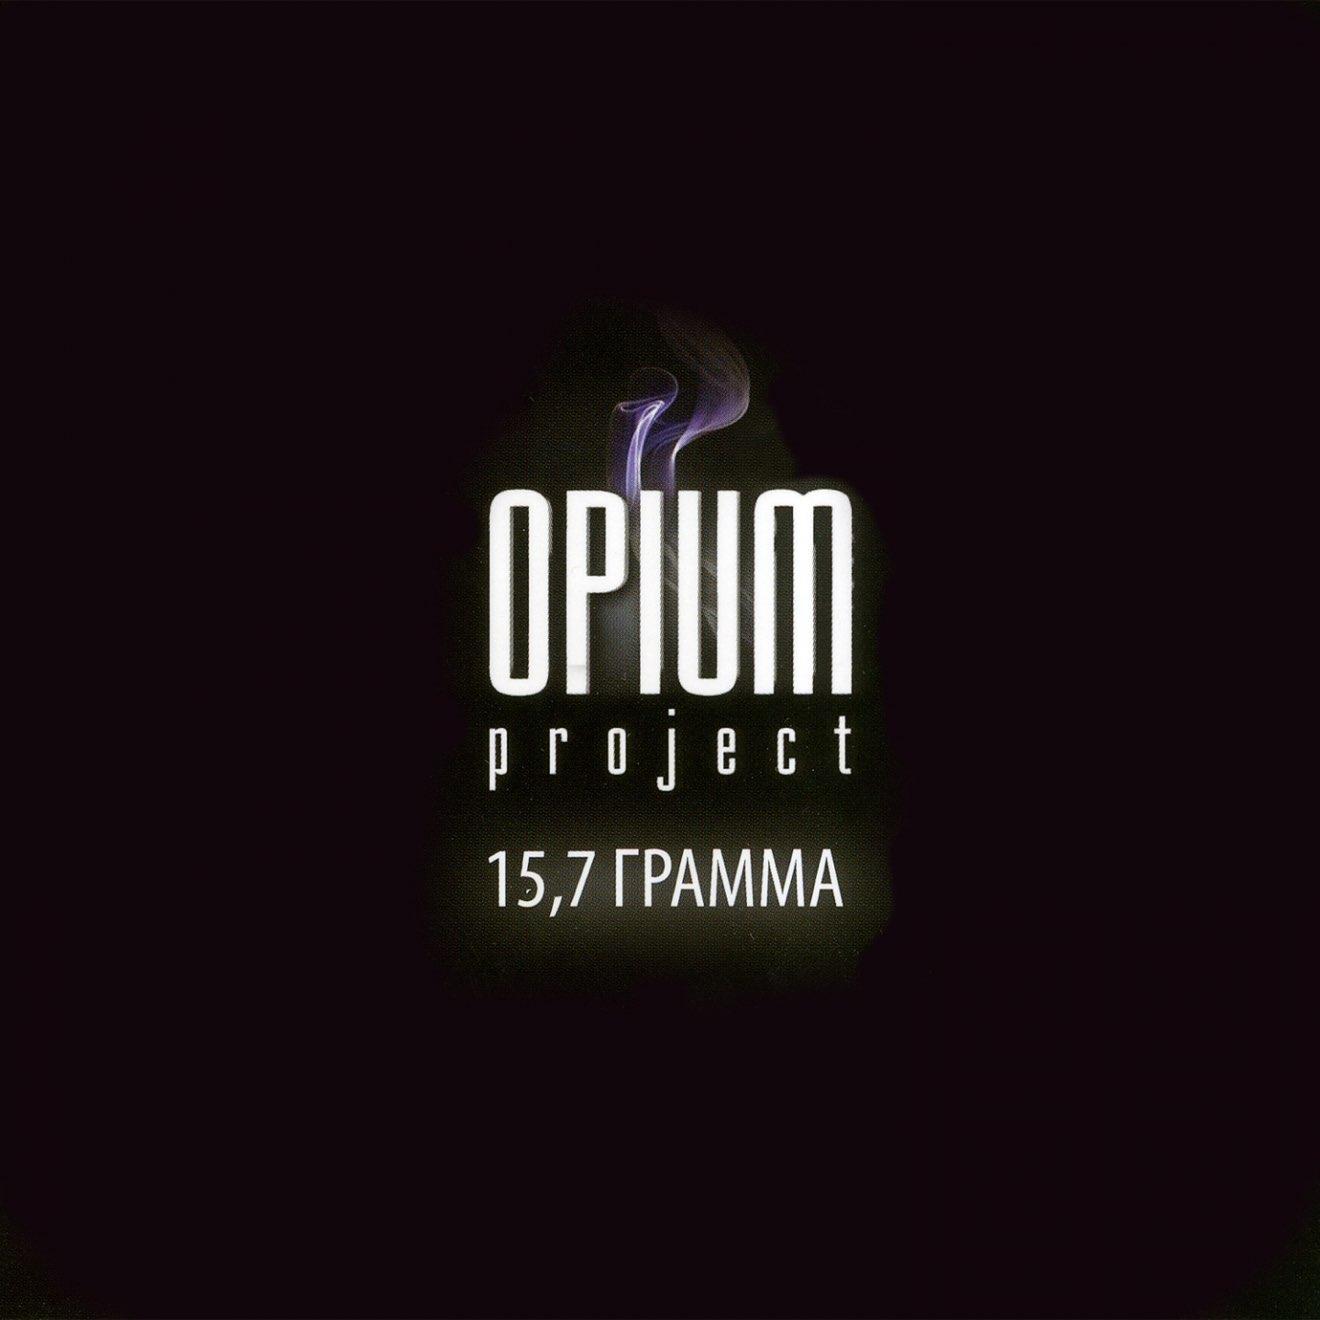 OPIUM project